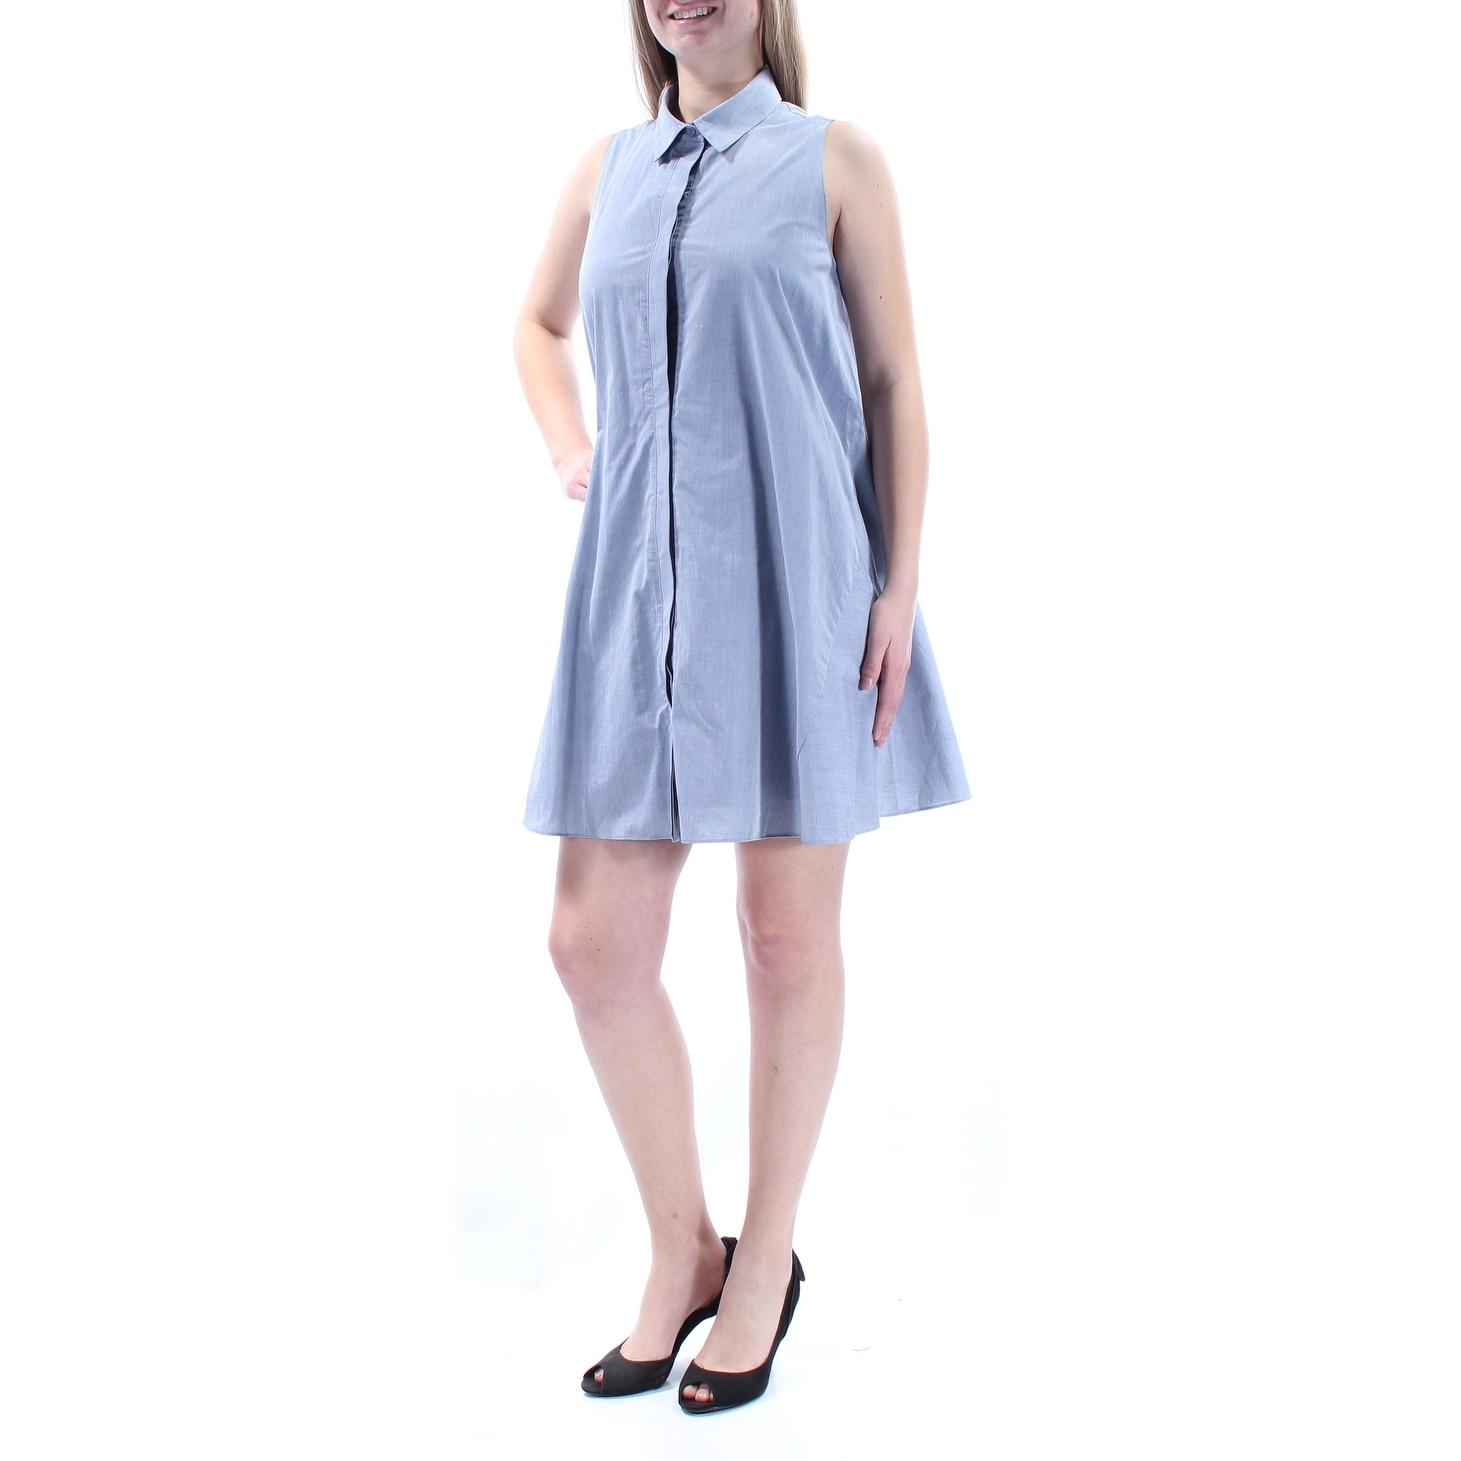 Shop Rachel Roy Womens Blue Sleeveless Collared Mini Shirt Dress